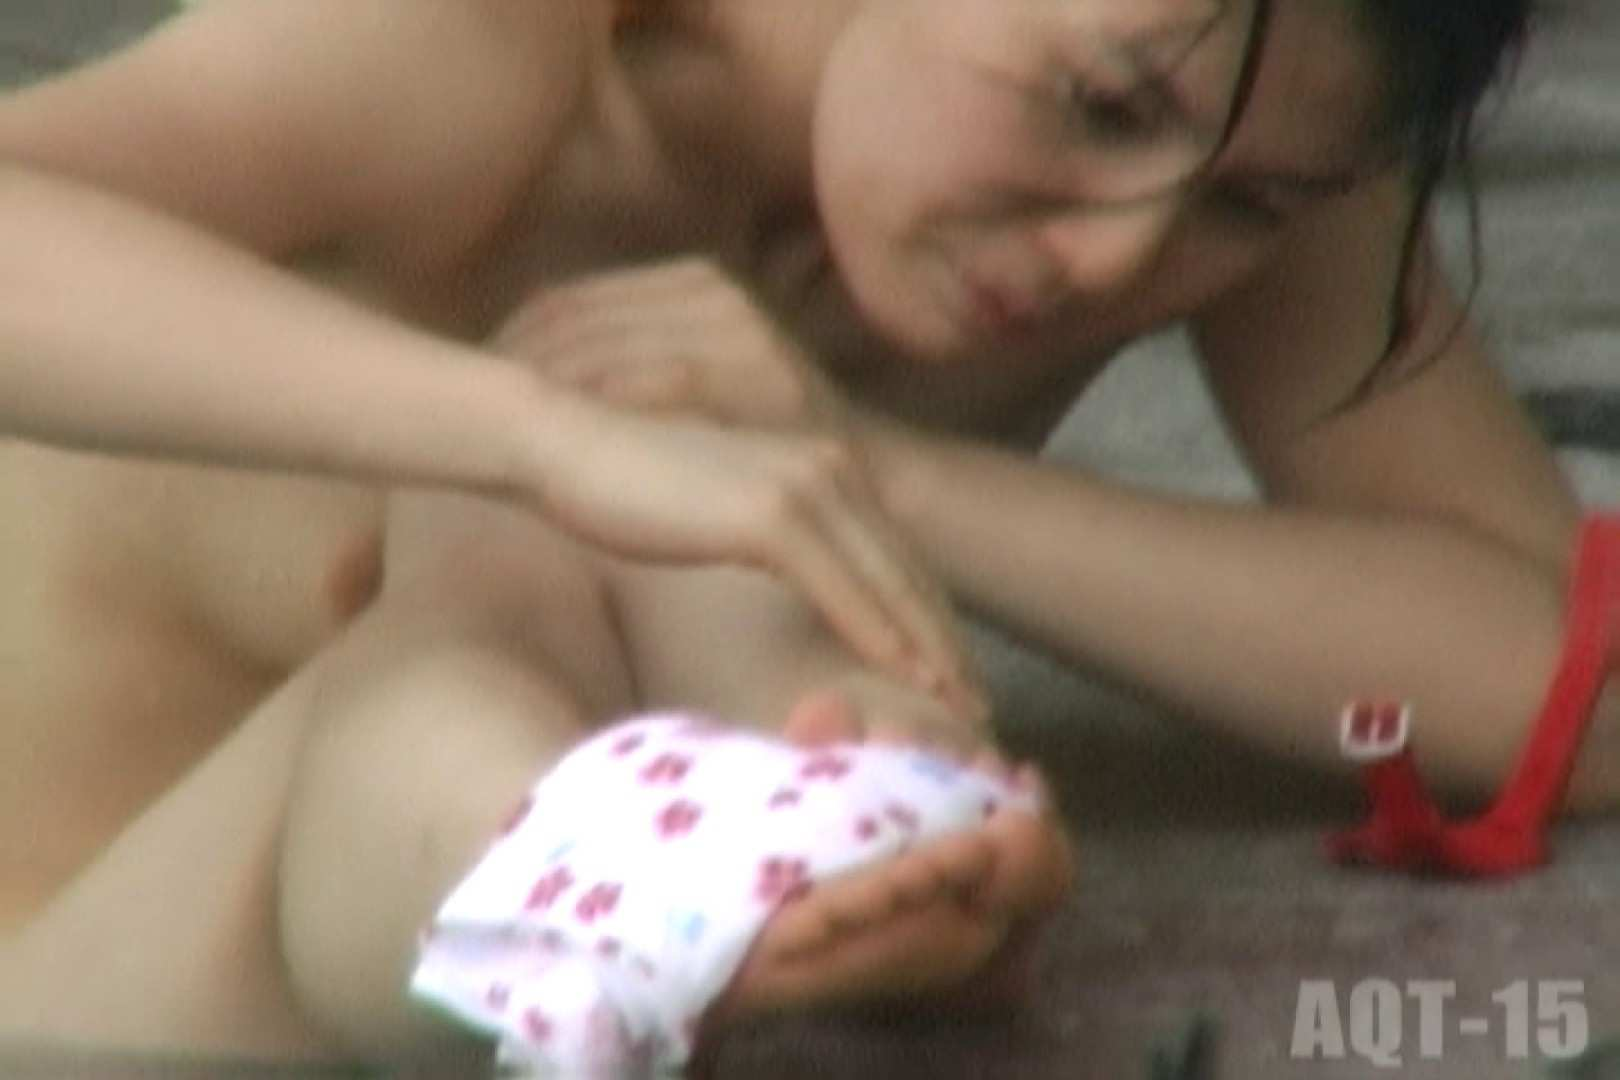 Aquaな露天風呂Vol.832 OL女体 セックス無修正動画無料 79連発 11